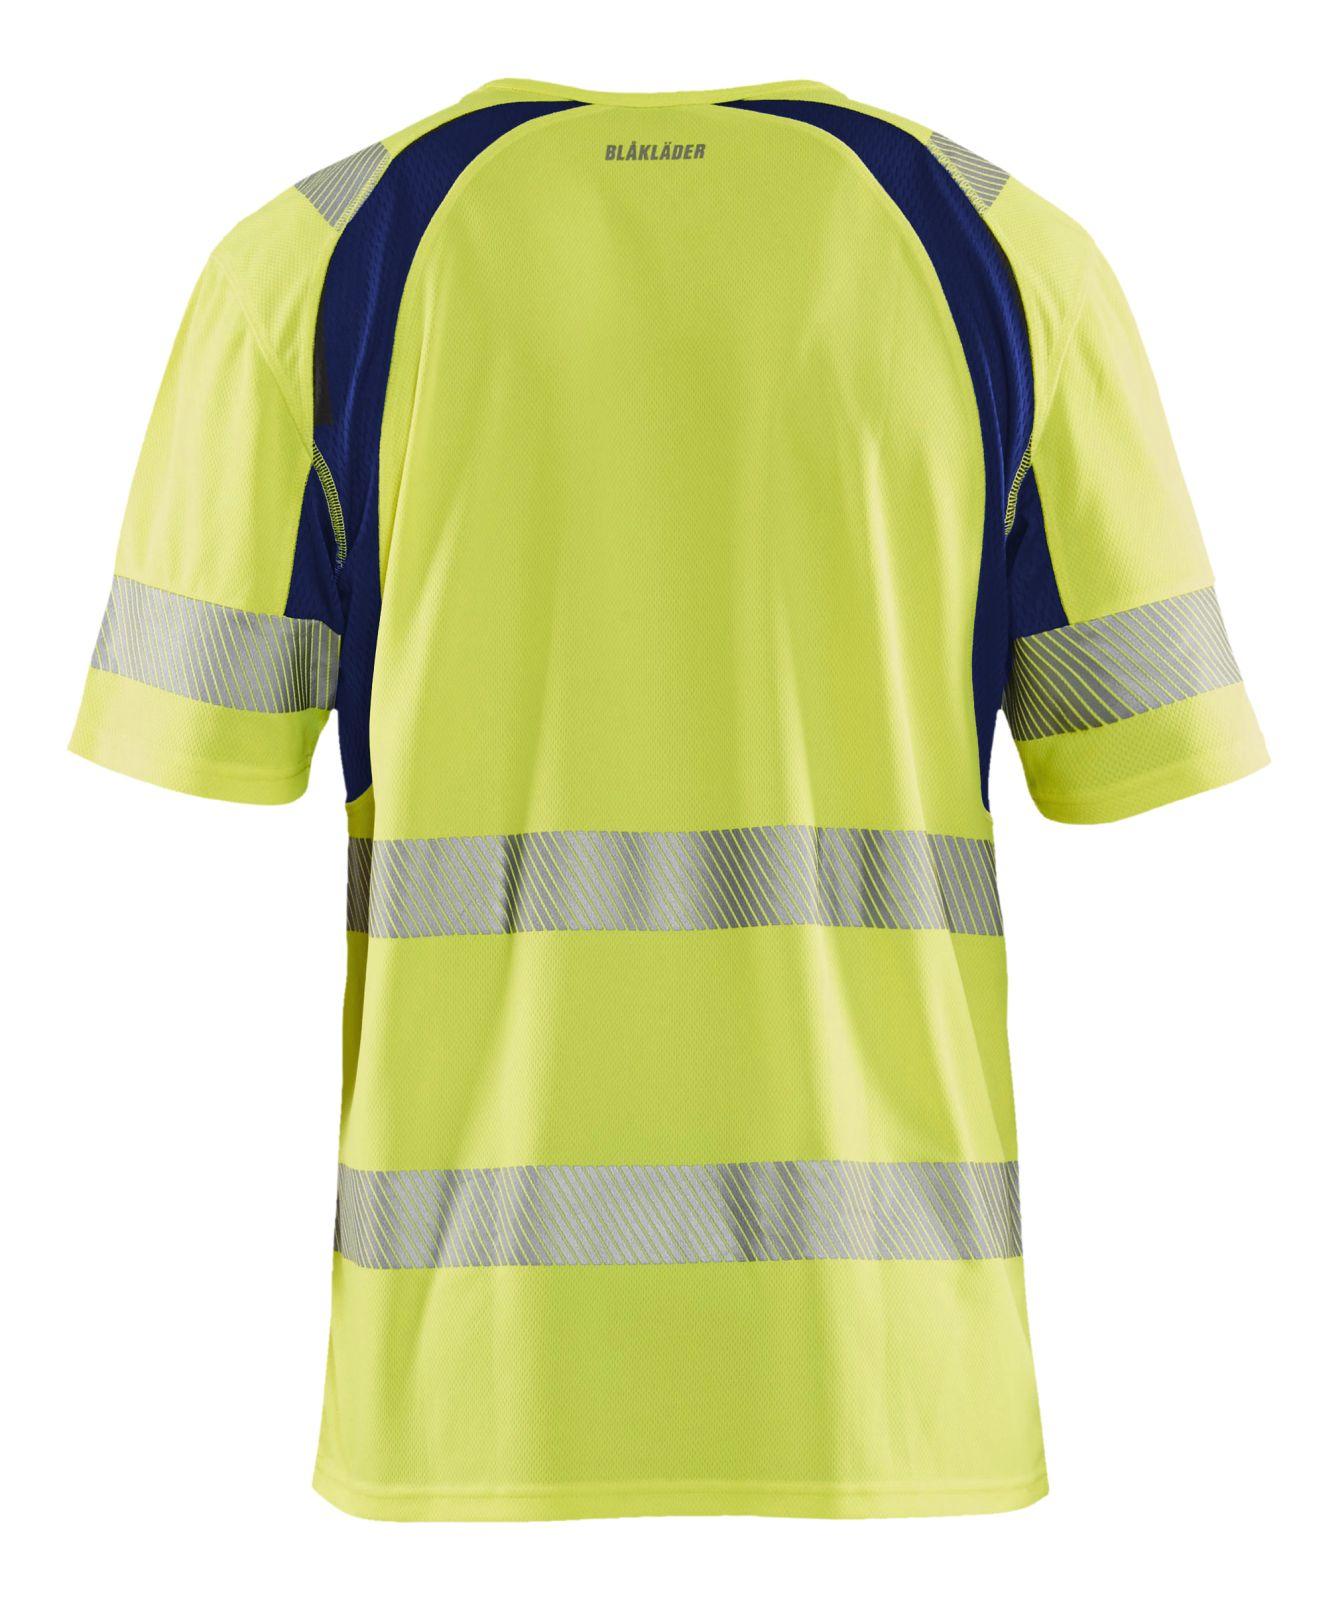 Blaklader T-shirts 33971013 High Vis UPF40+ UV fluo geel-marineblauw(3389)